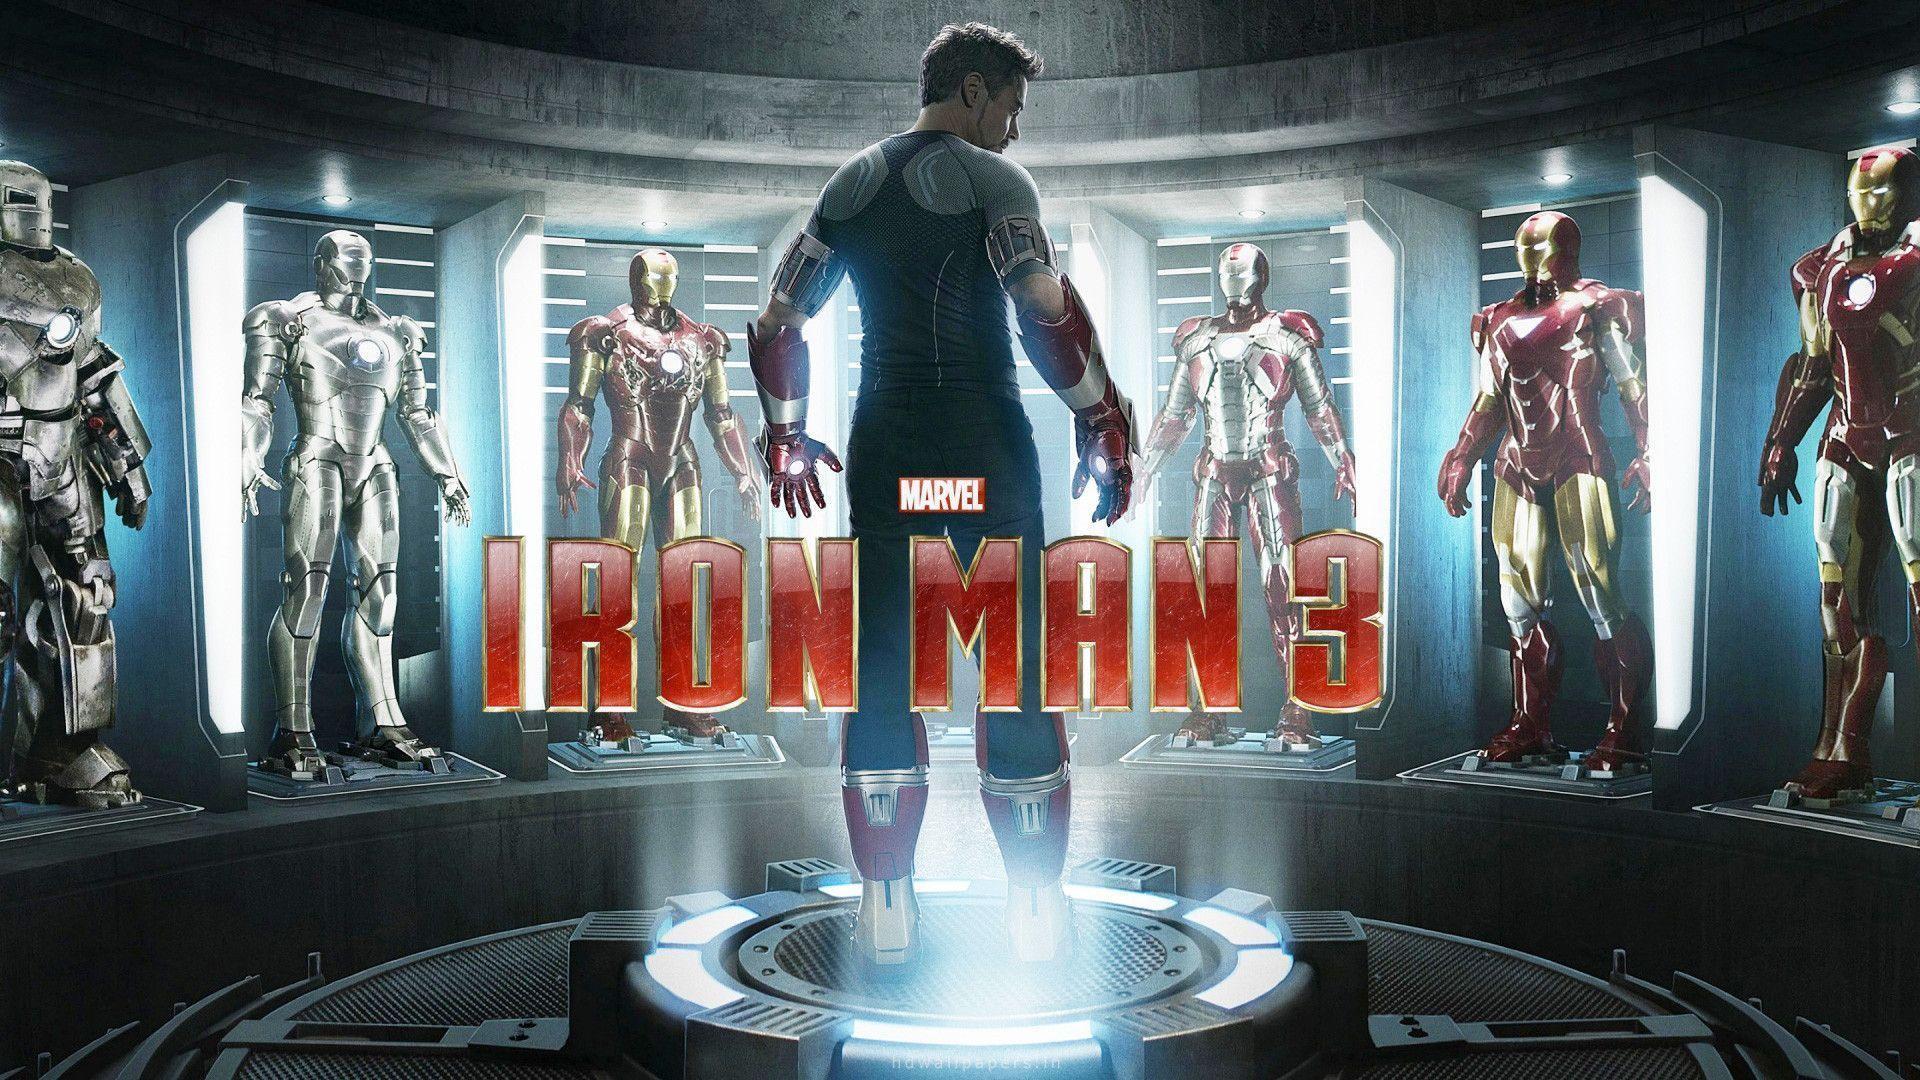 Tony Stark Hd Wallpapers Hd Wallpapers Iron Man 3 Wallpaper Cave